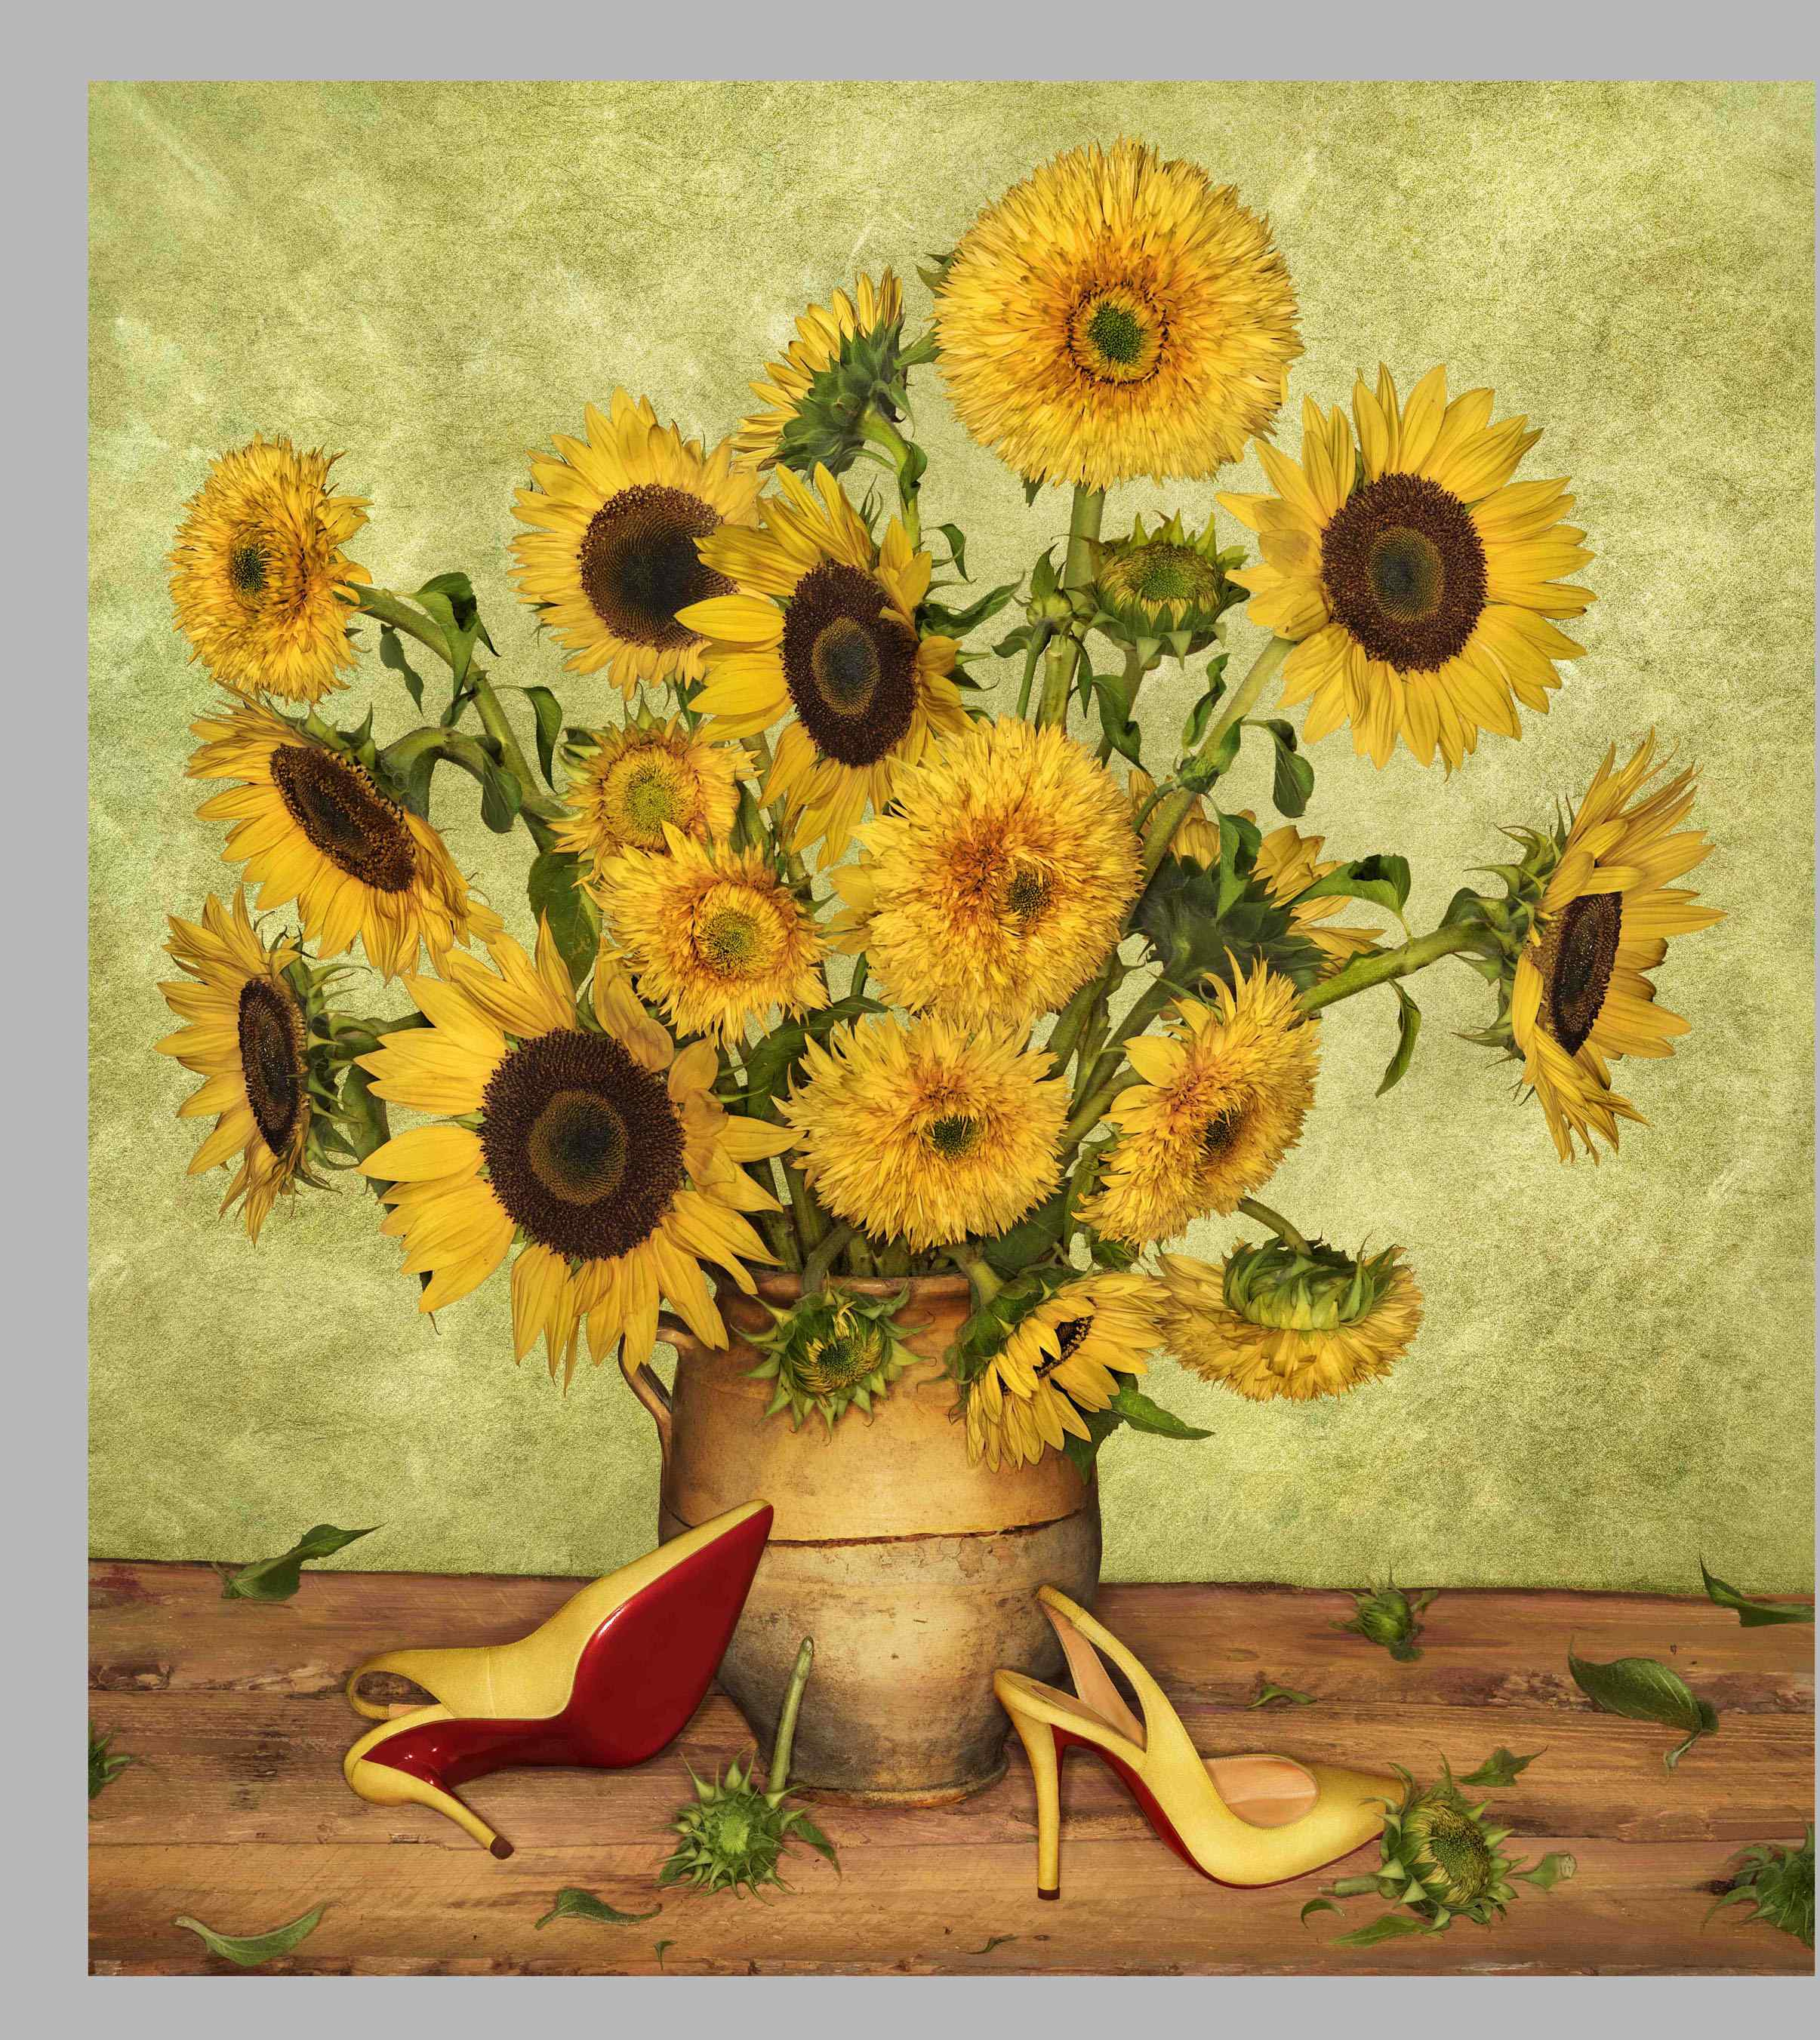 SS14 Louboutin Look Books Van Gogh _ Photographer Peter Lippman.jpg